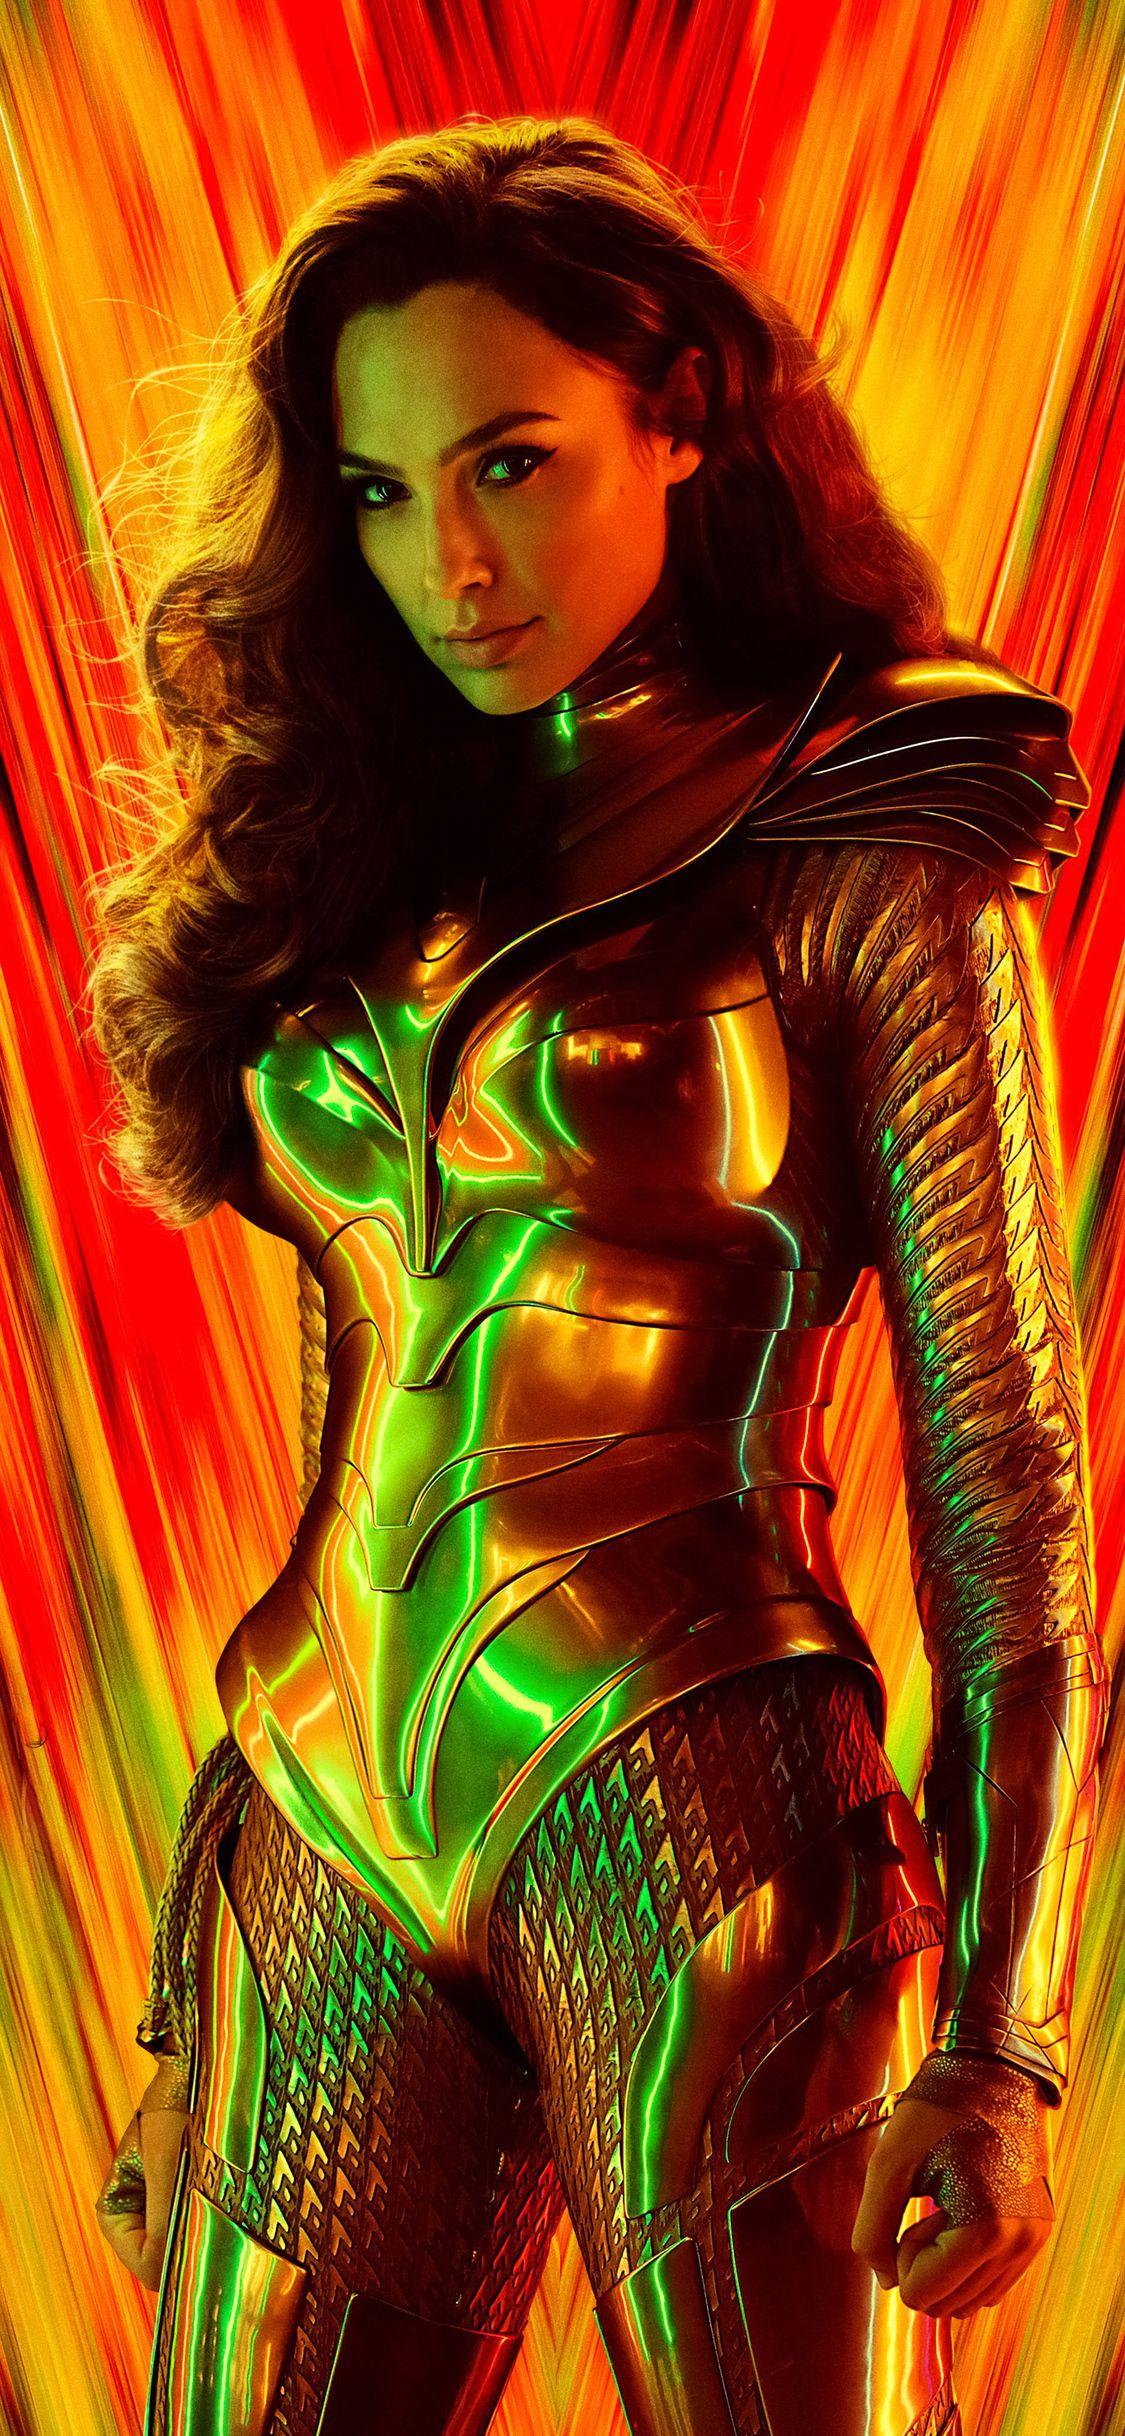 4k Wonder Woman 1984 Movie In 1125x2436 Resolution In 2020 Gal Gadot Wonder Woman Wonder Woman Gal Gadot